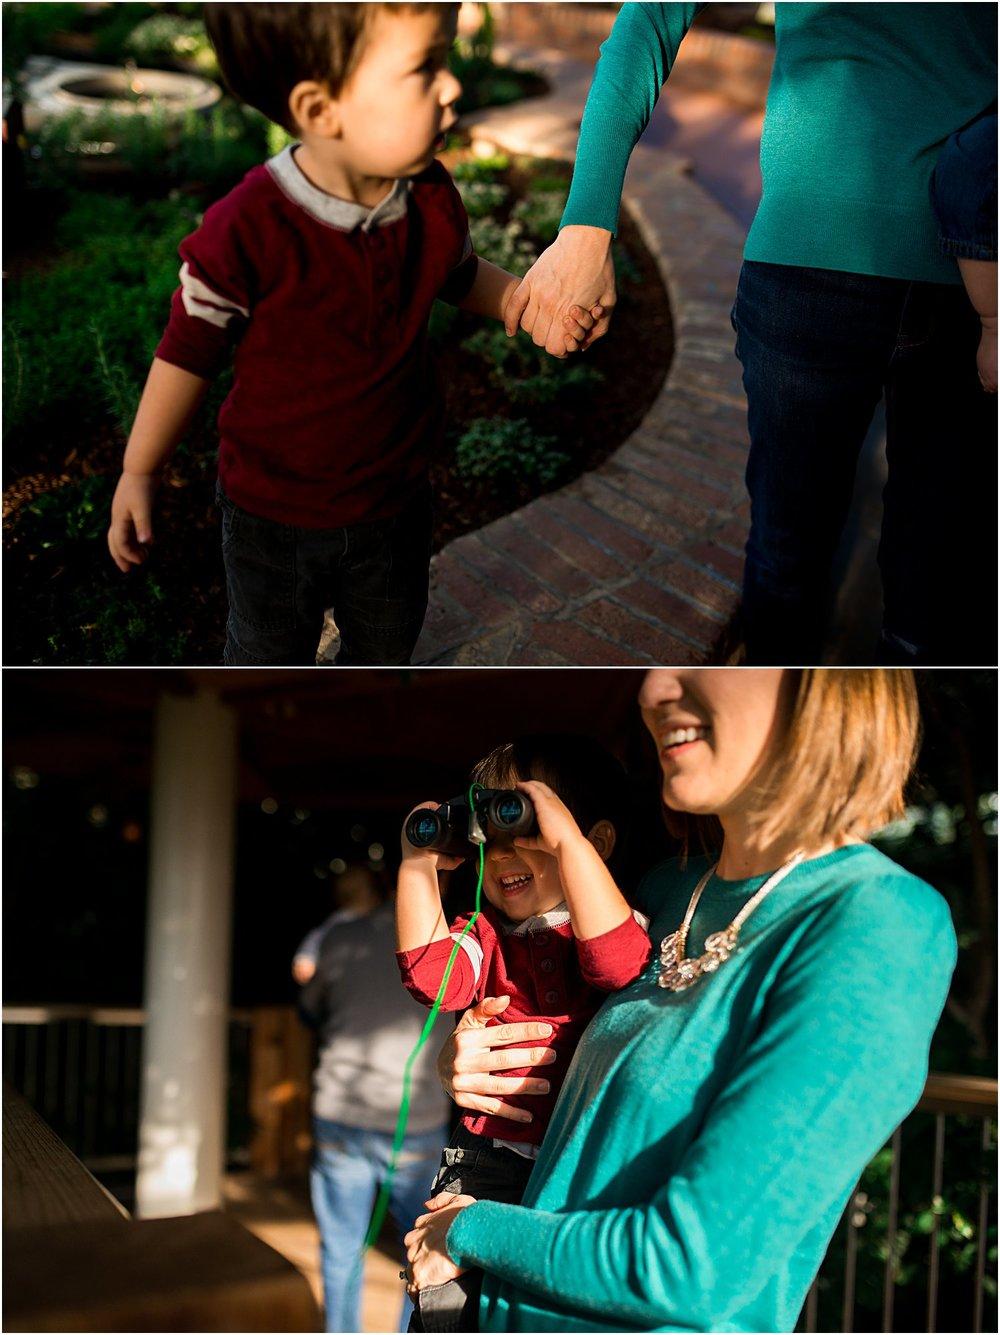 familypictures_nov2016-17.jpg